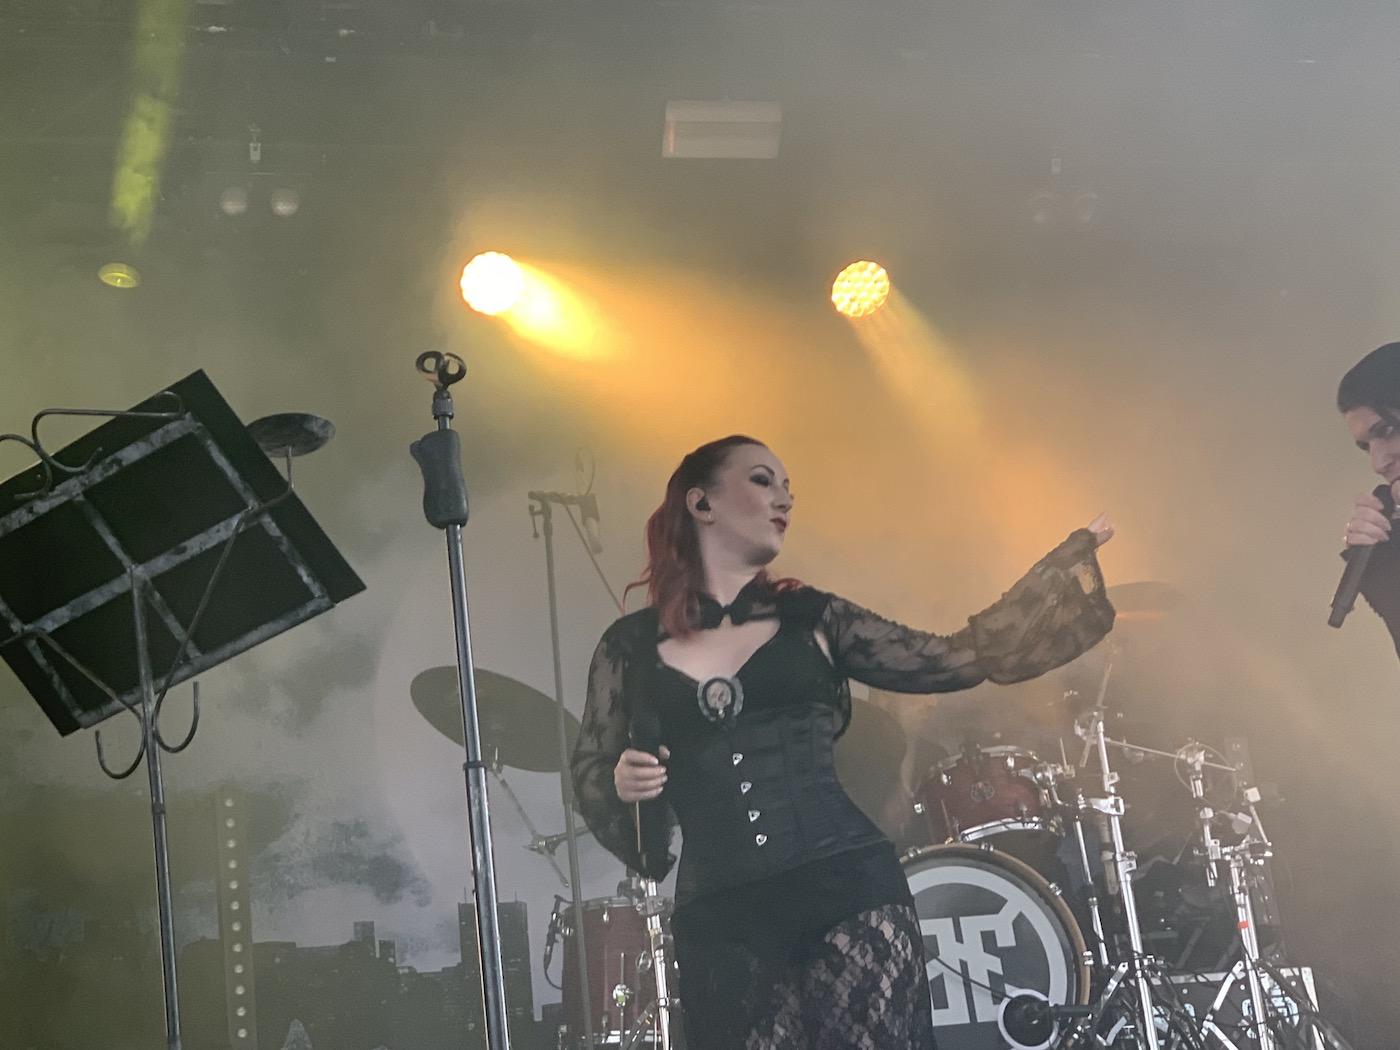 mark_benecke_amphi_festival_koeln_2019 - 87.jpg